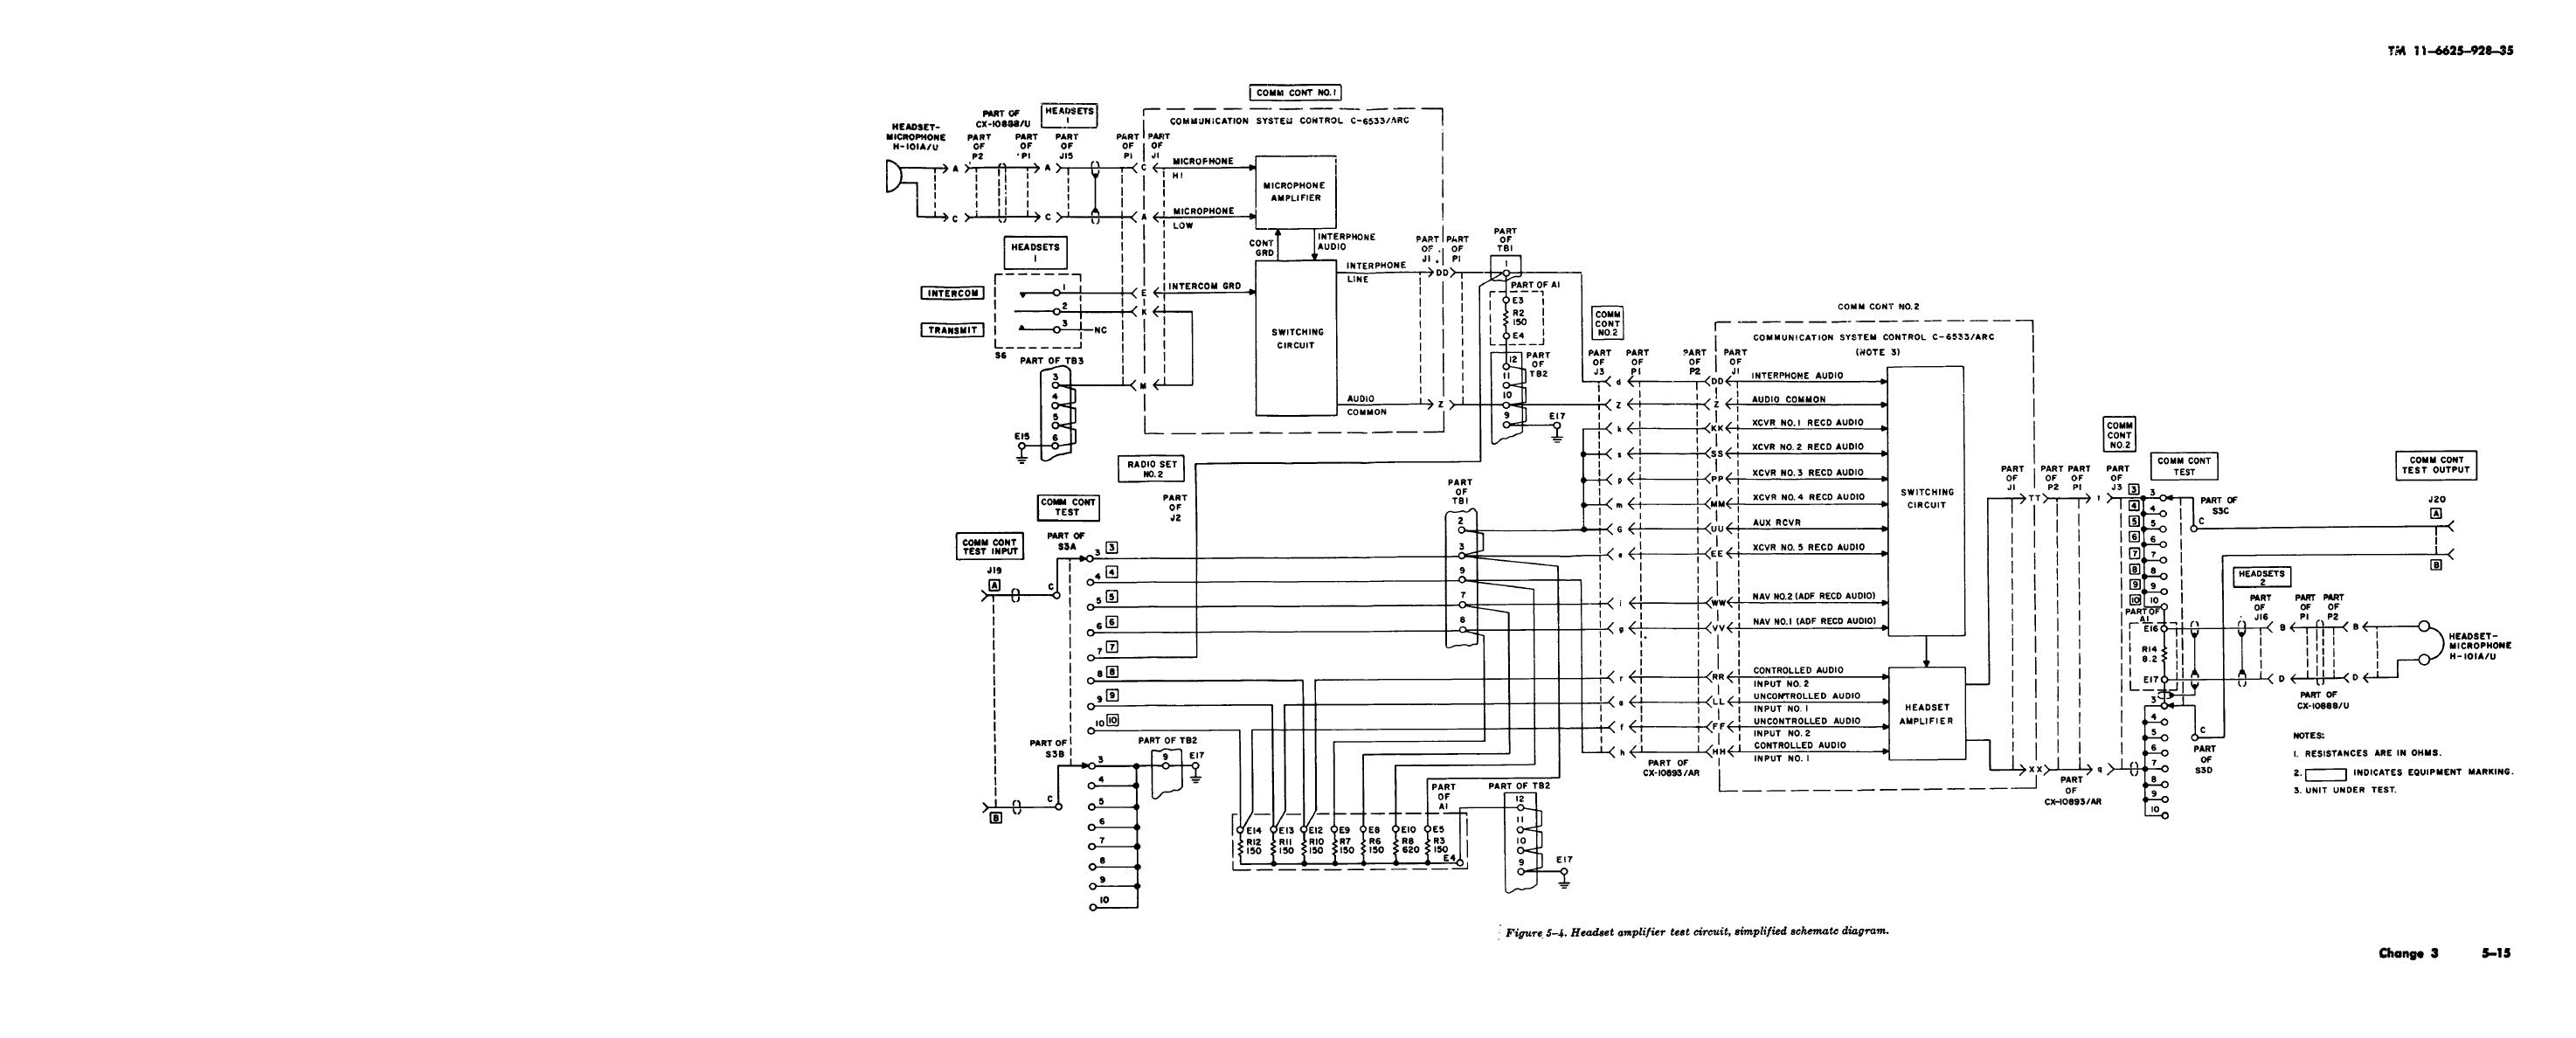 Groß Headset Schaltplan Fotos - Elektrische Schaltplan-Ideen ...